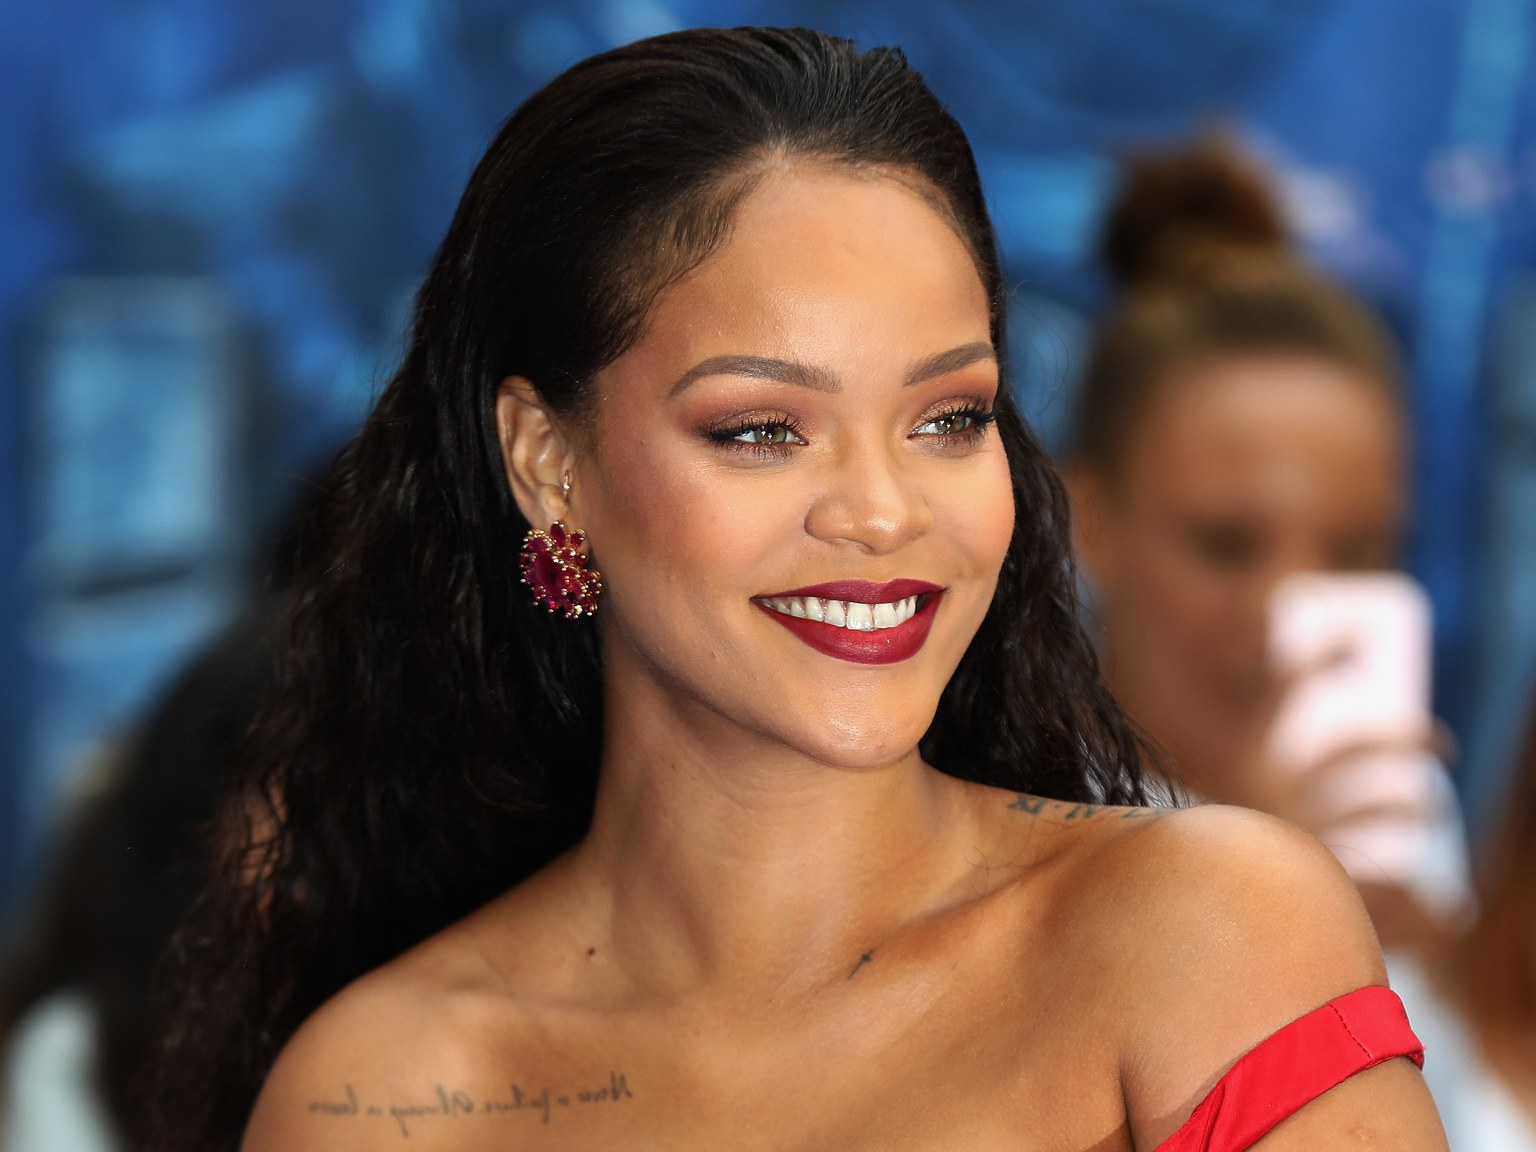 Rihanna Celebrates 31st Birthday In Beverly Hills Without Her billionaire Saudi boyfriend Hassan Jameel